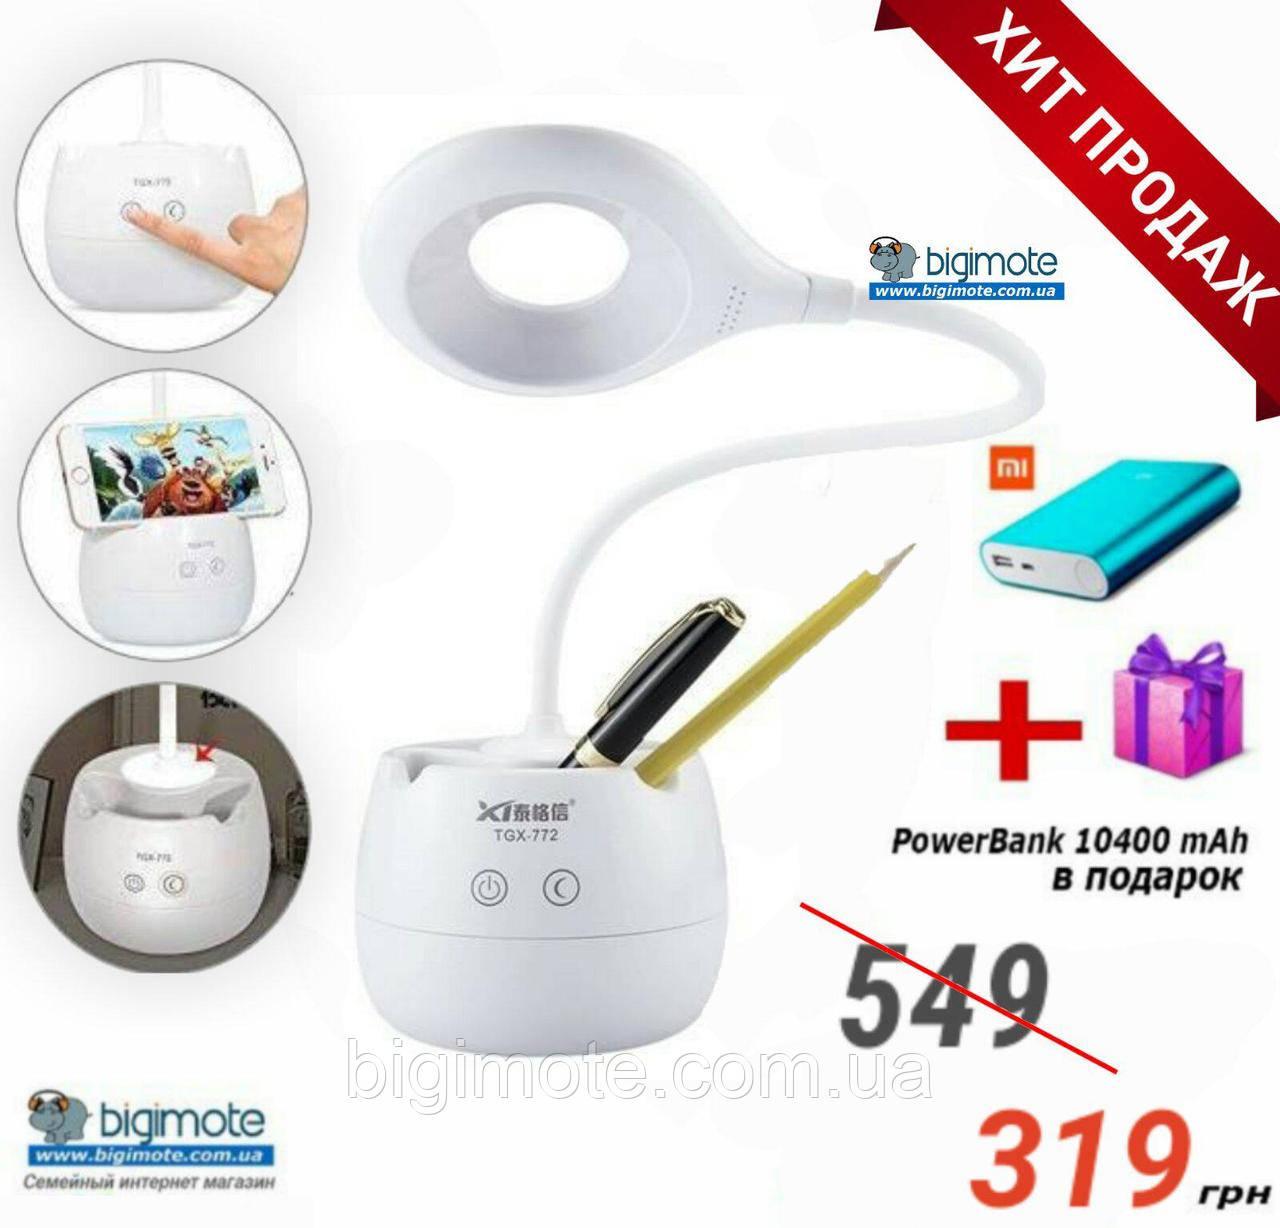 Лампа настольная,ночник micro usb, органайзер,подставка под телефон, настольная лампа кольцевая,TGX772s